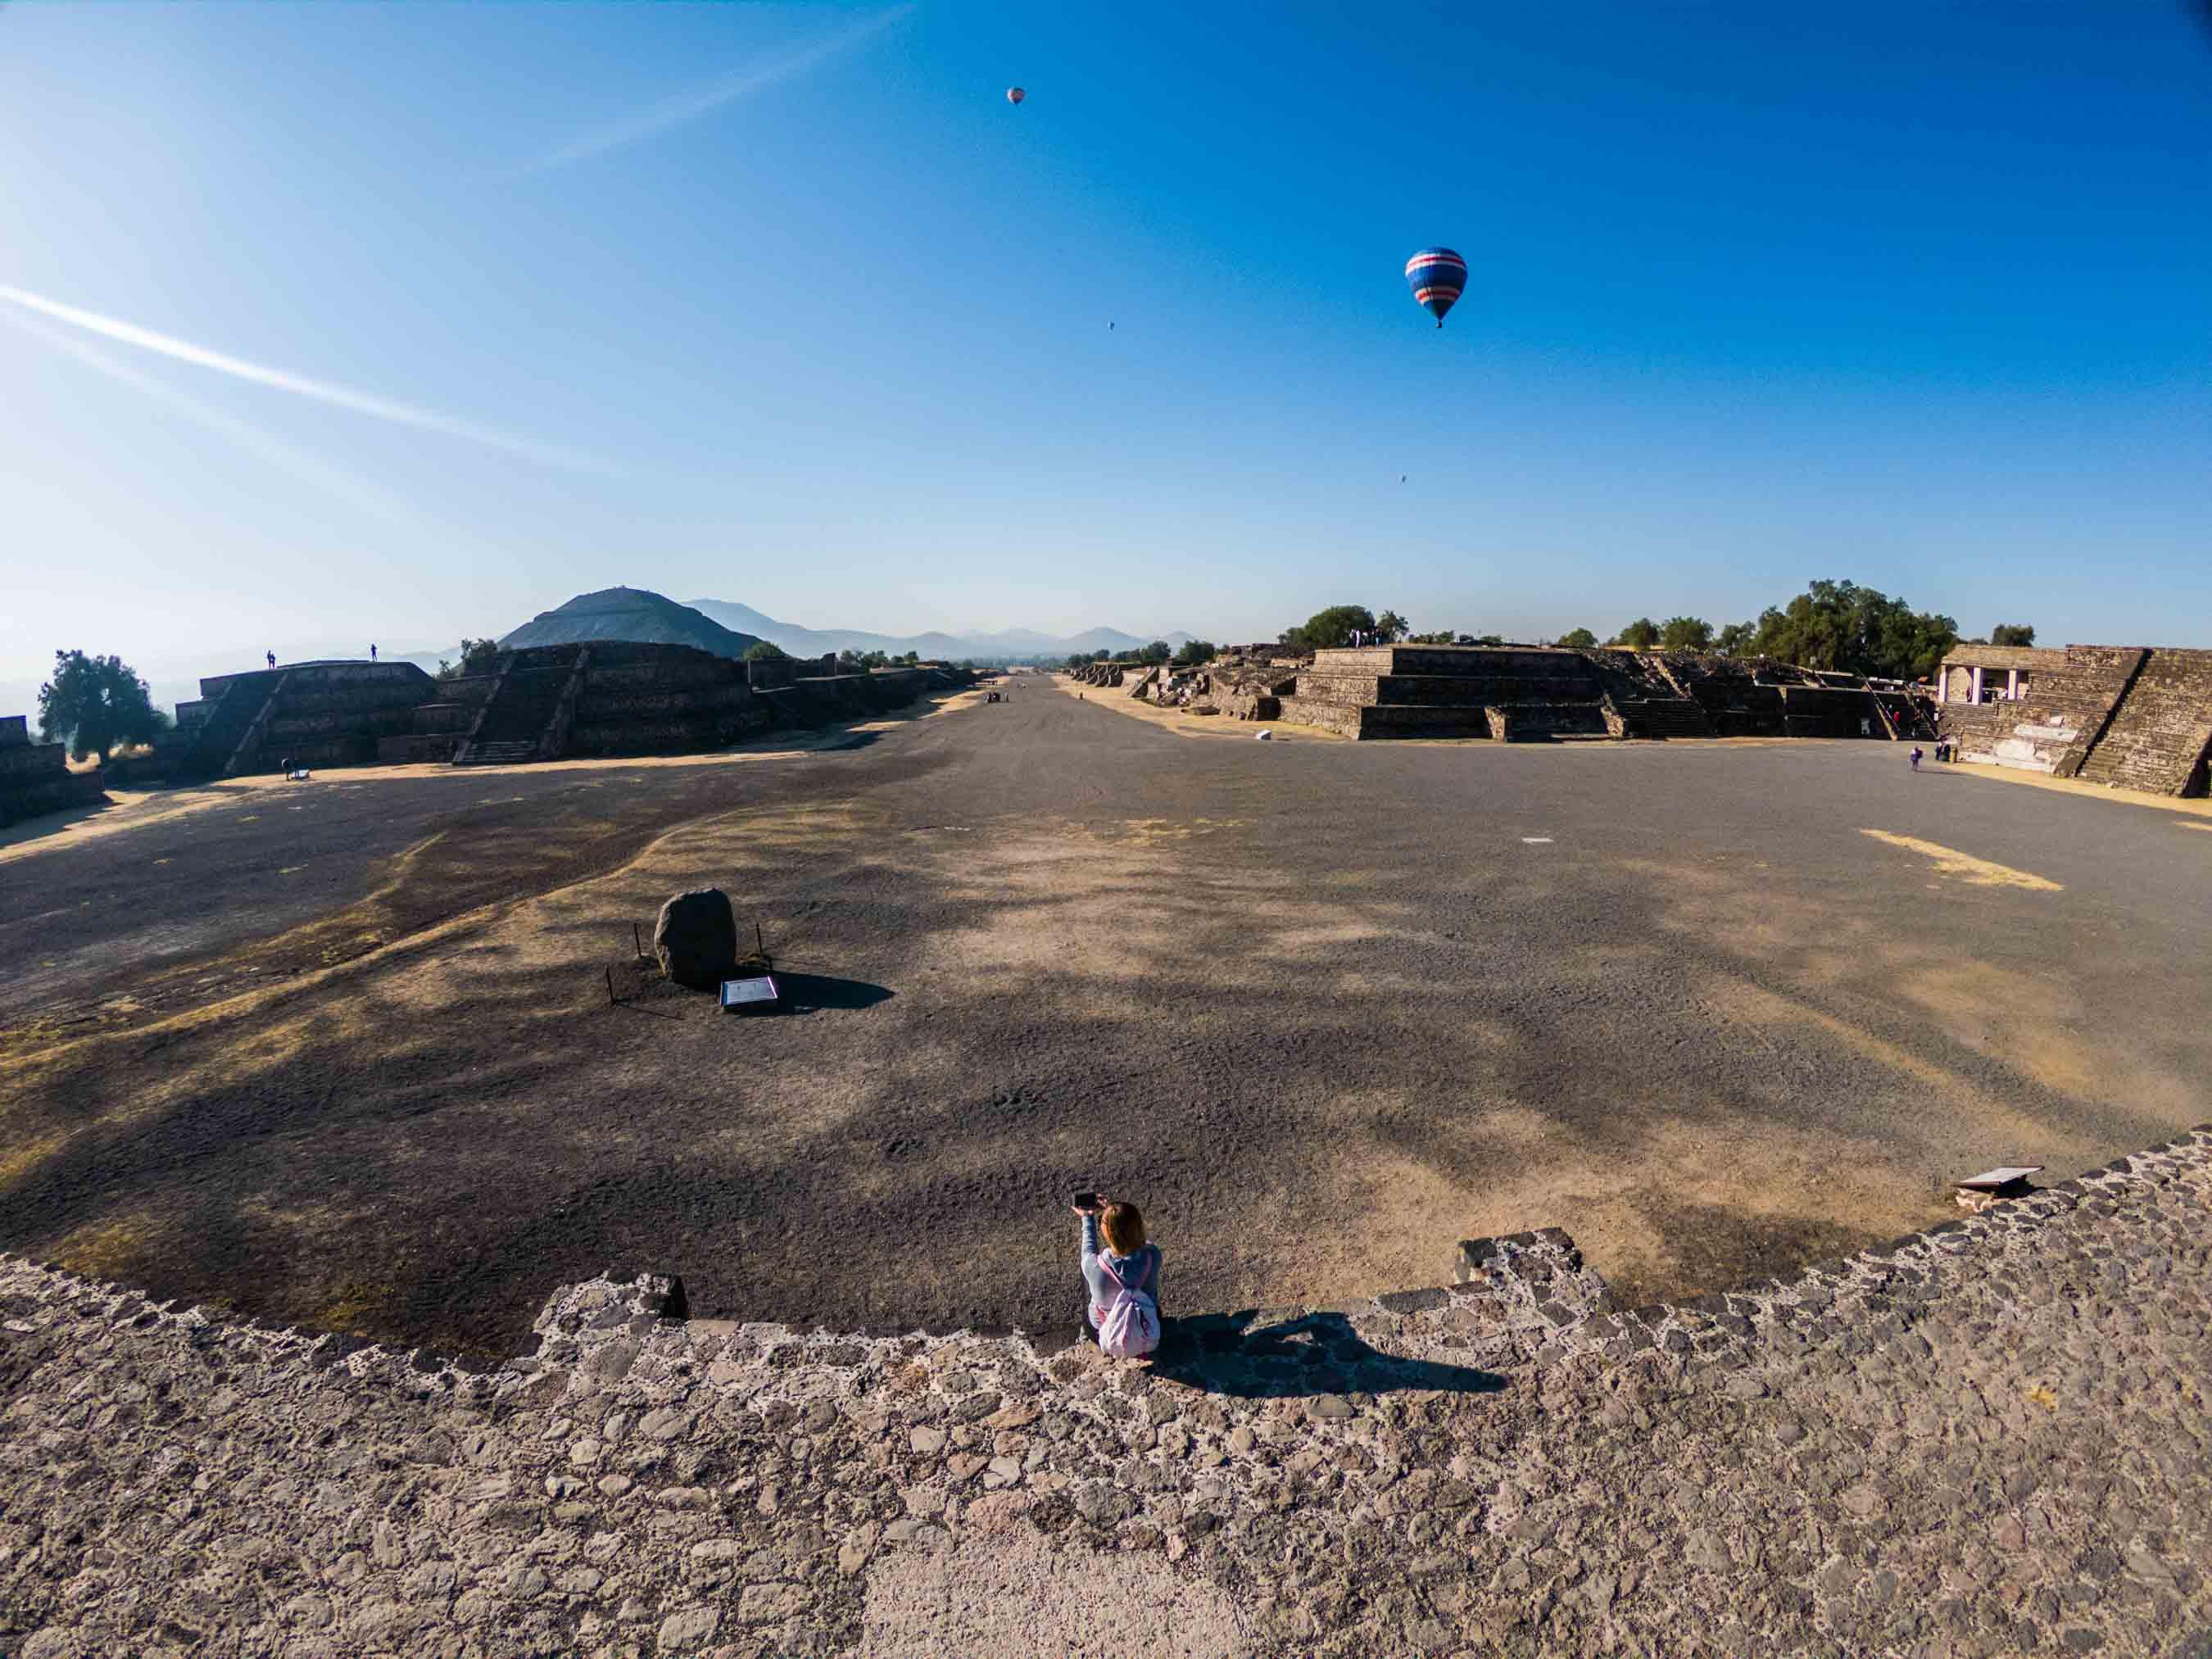 Teotihuacan Pyramids Mexico City Enrico Pescantini photographer 4